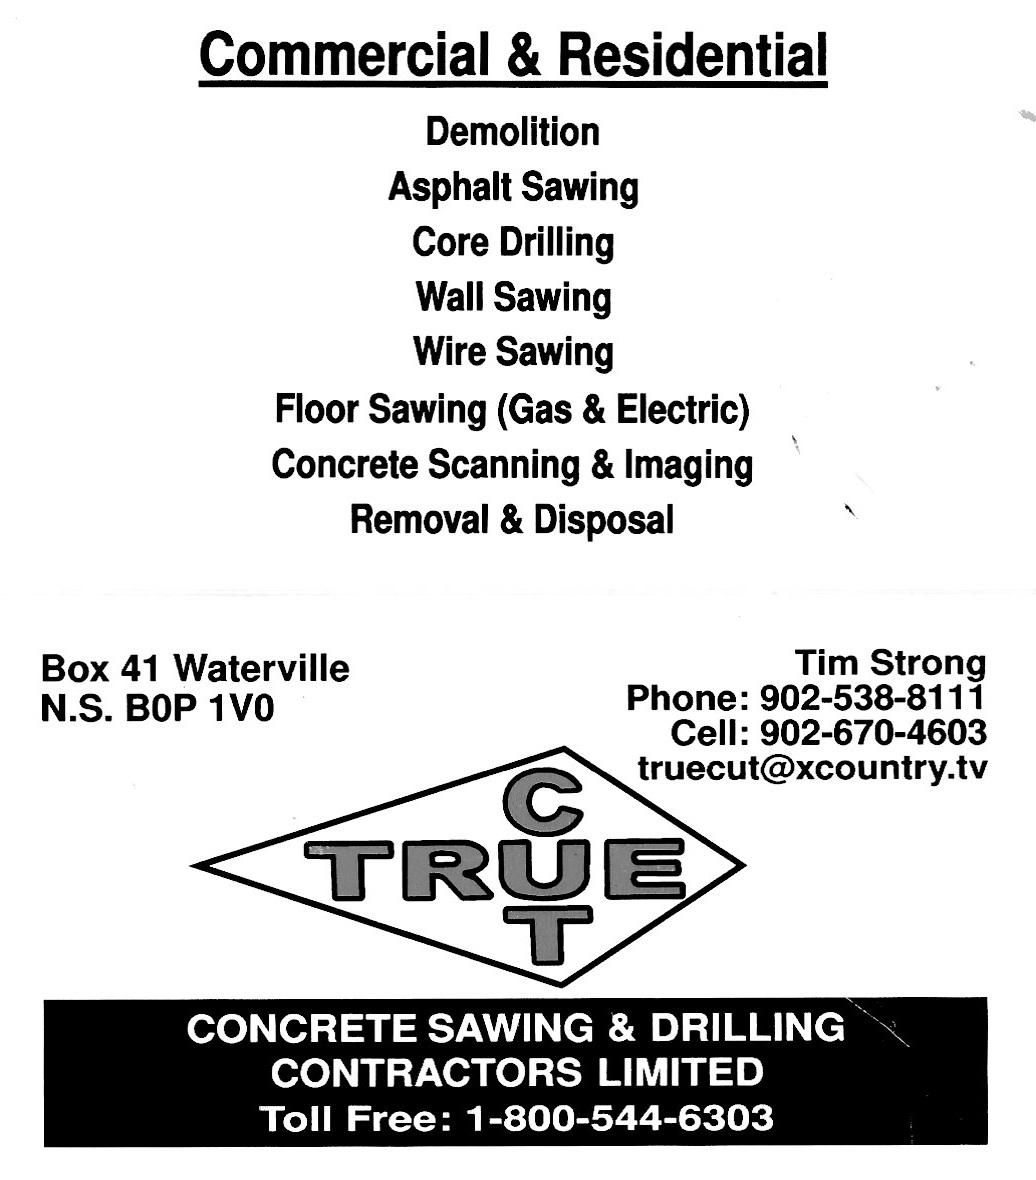 TrueCut Concrete Sawing & Drilling